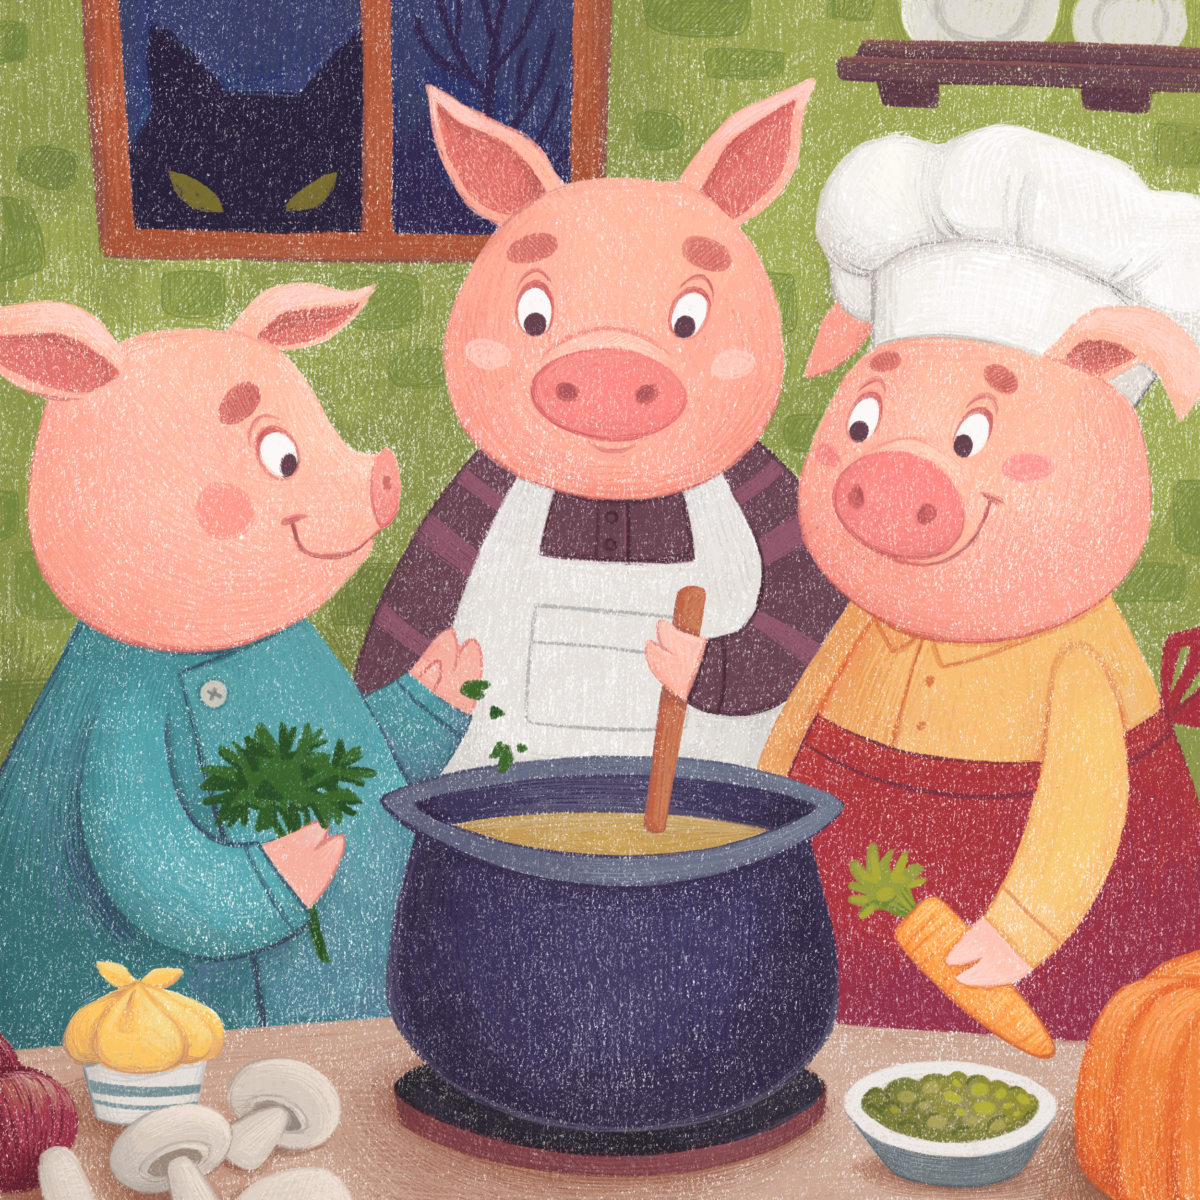 Children's book illustration by Margarita Levina